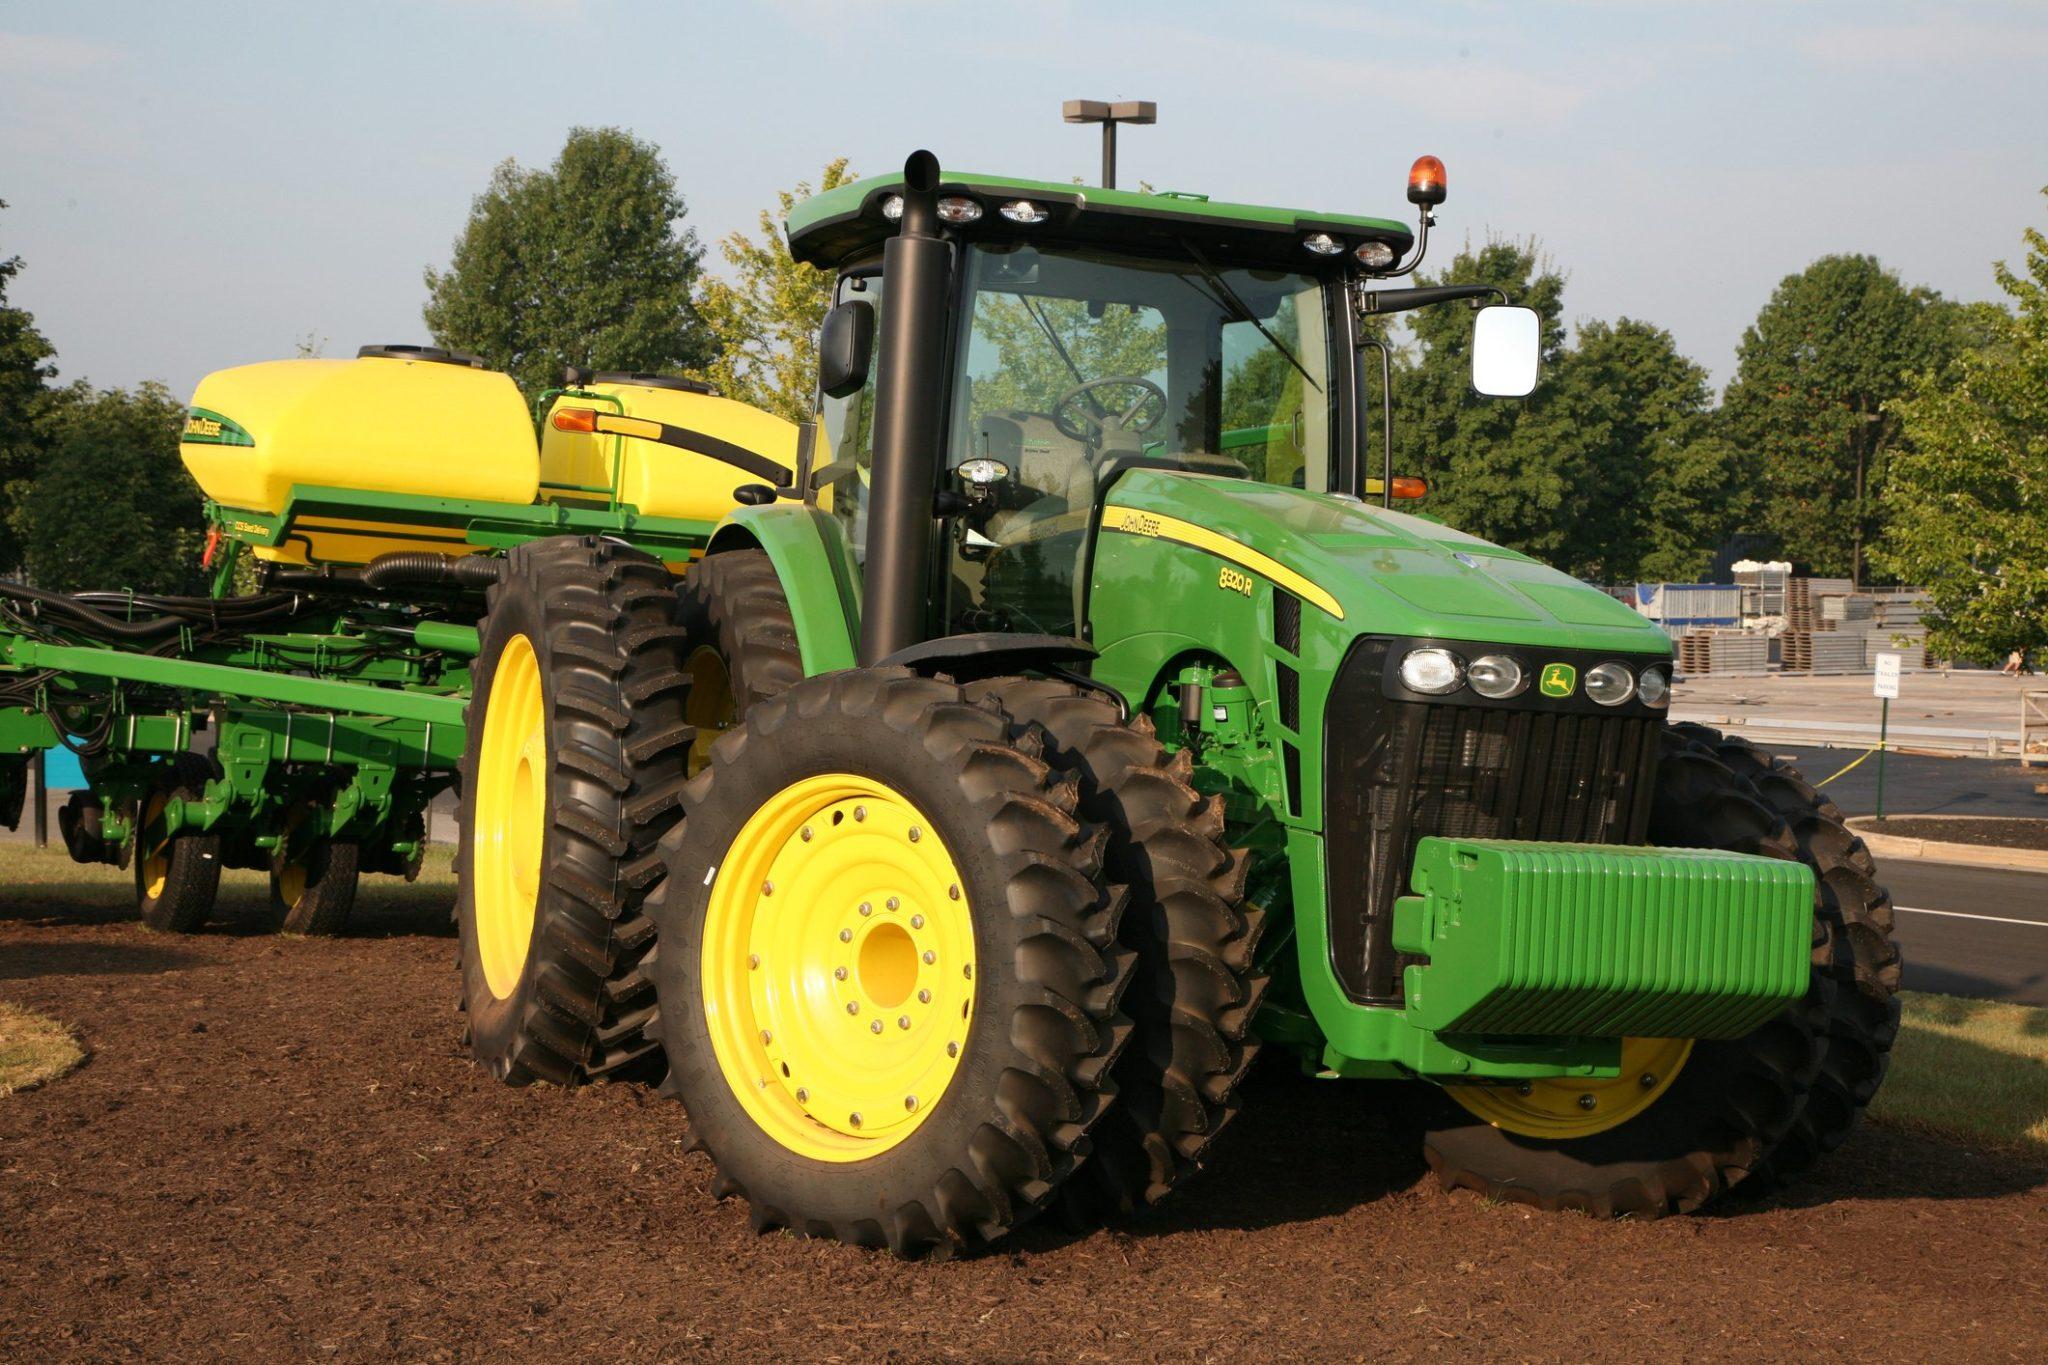 South East USA Tour to the National Farm Machinery Show 2020